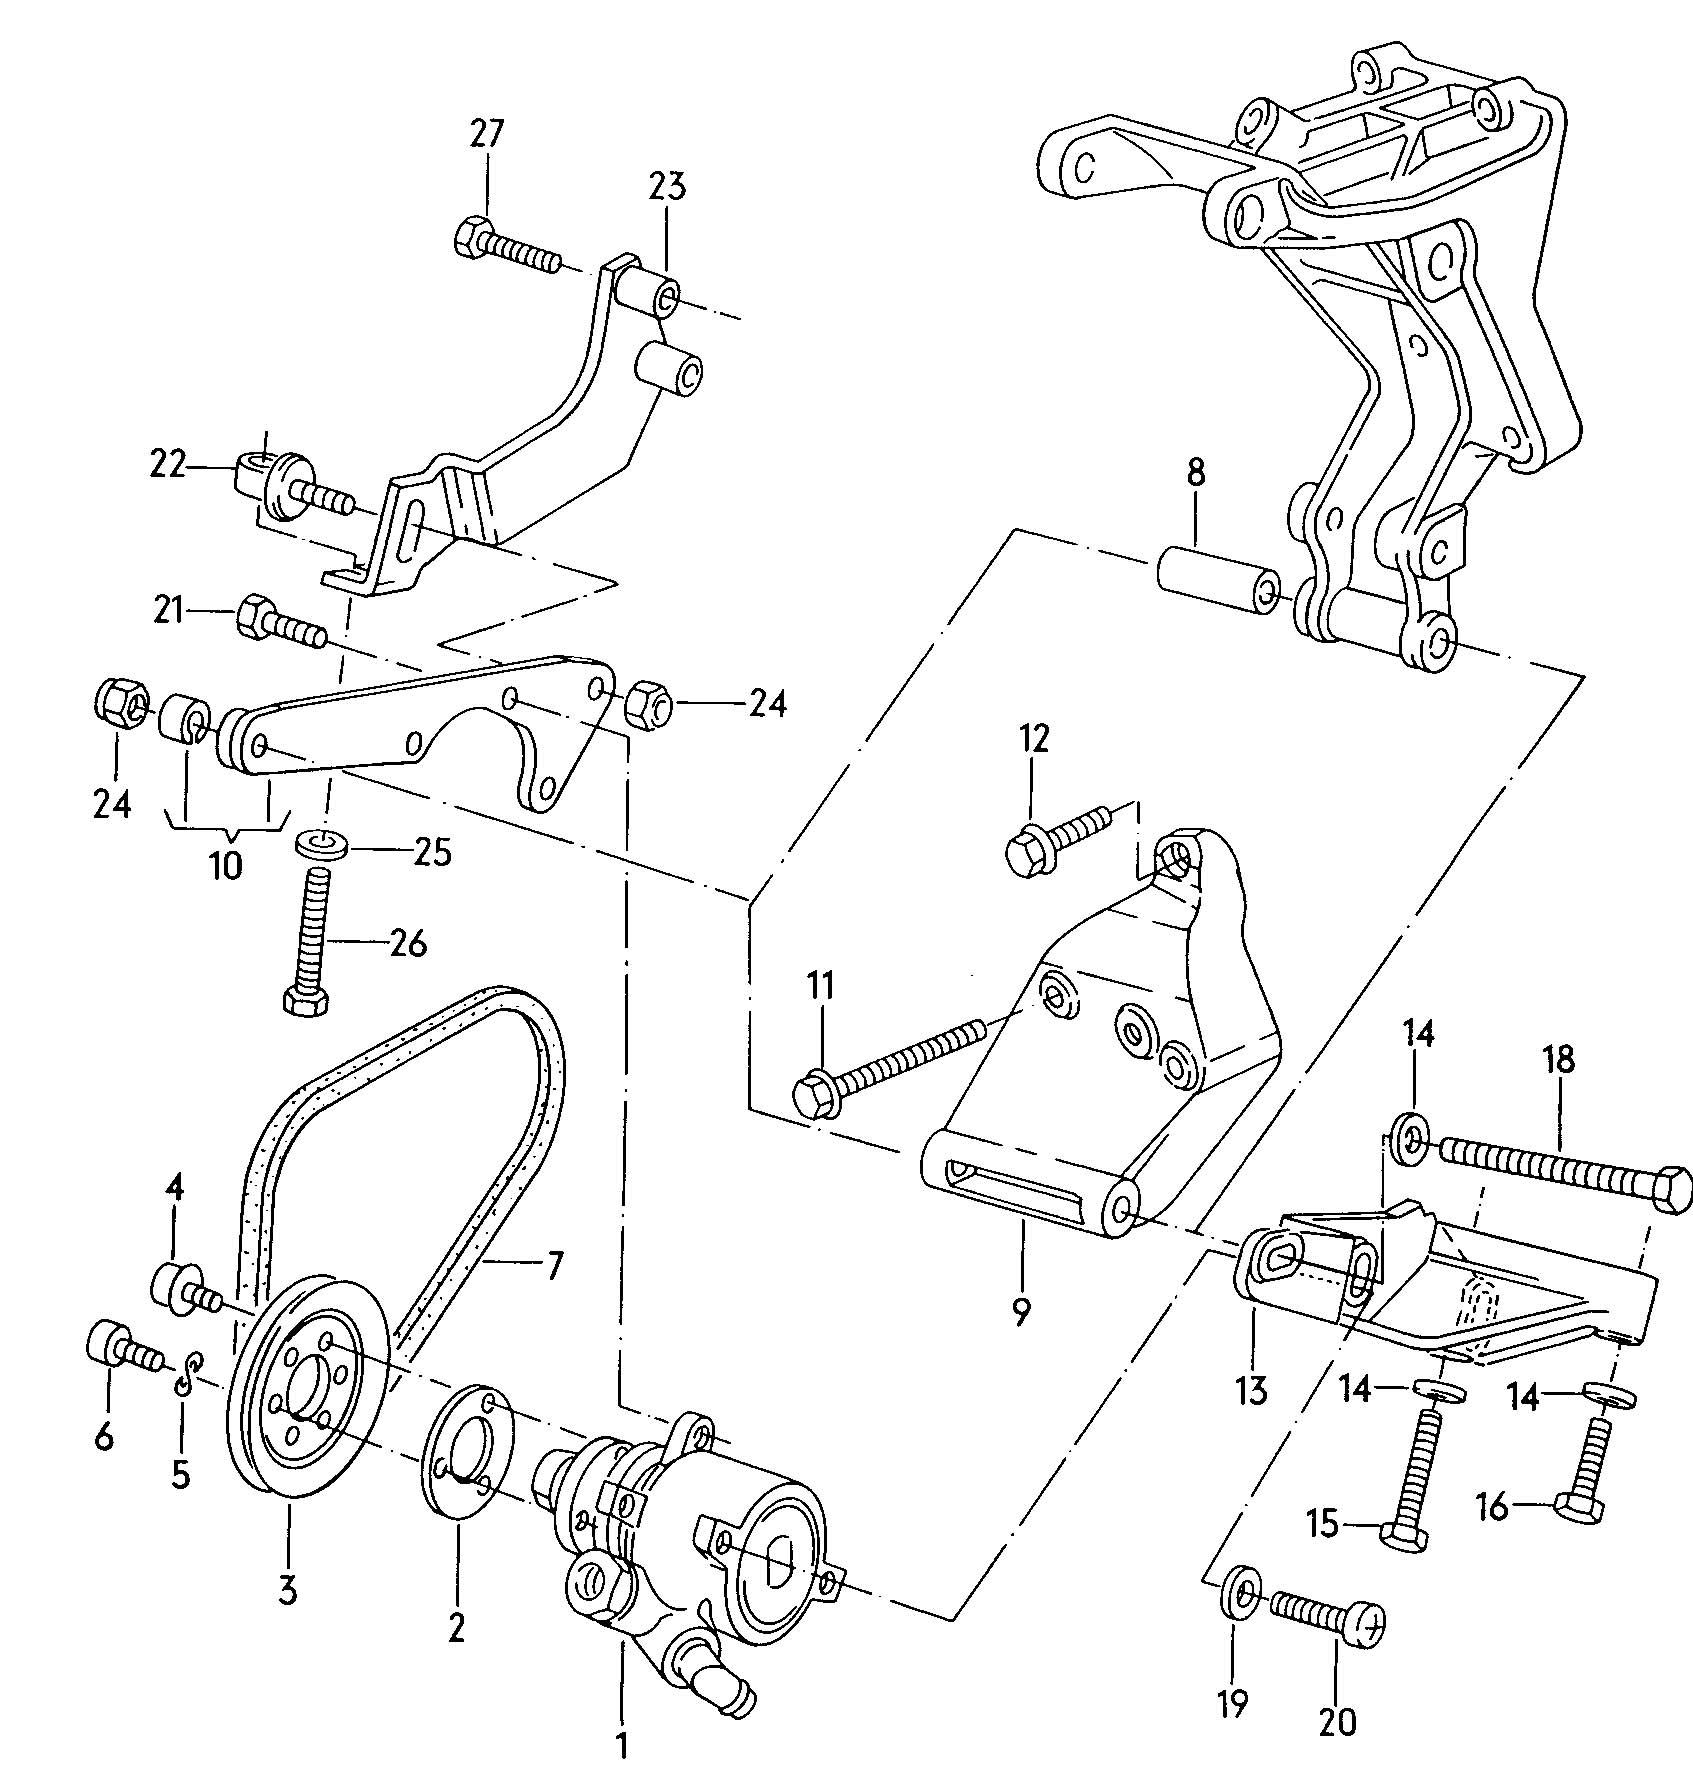 rexroth parts diagram rexroth hydraulic parts elsavadorla